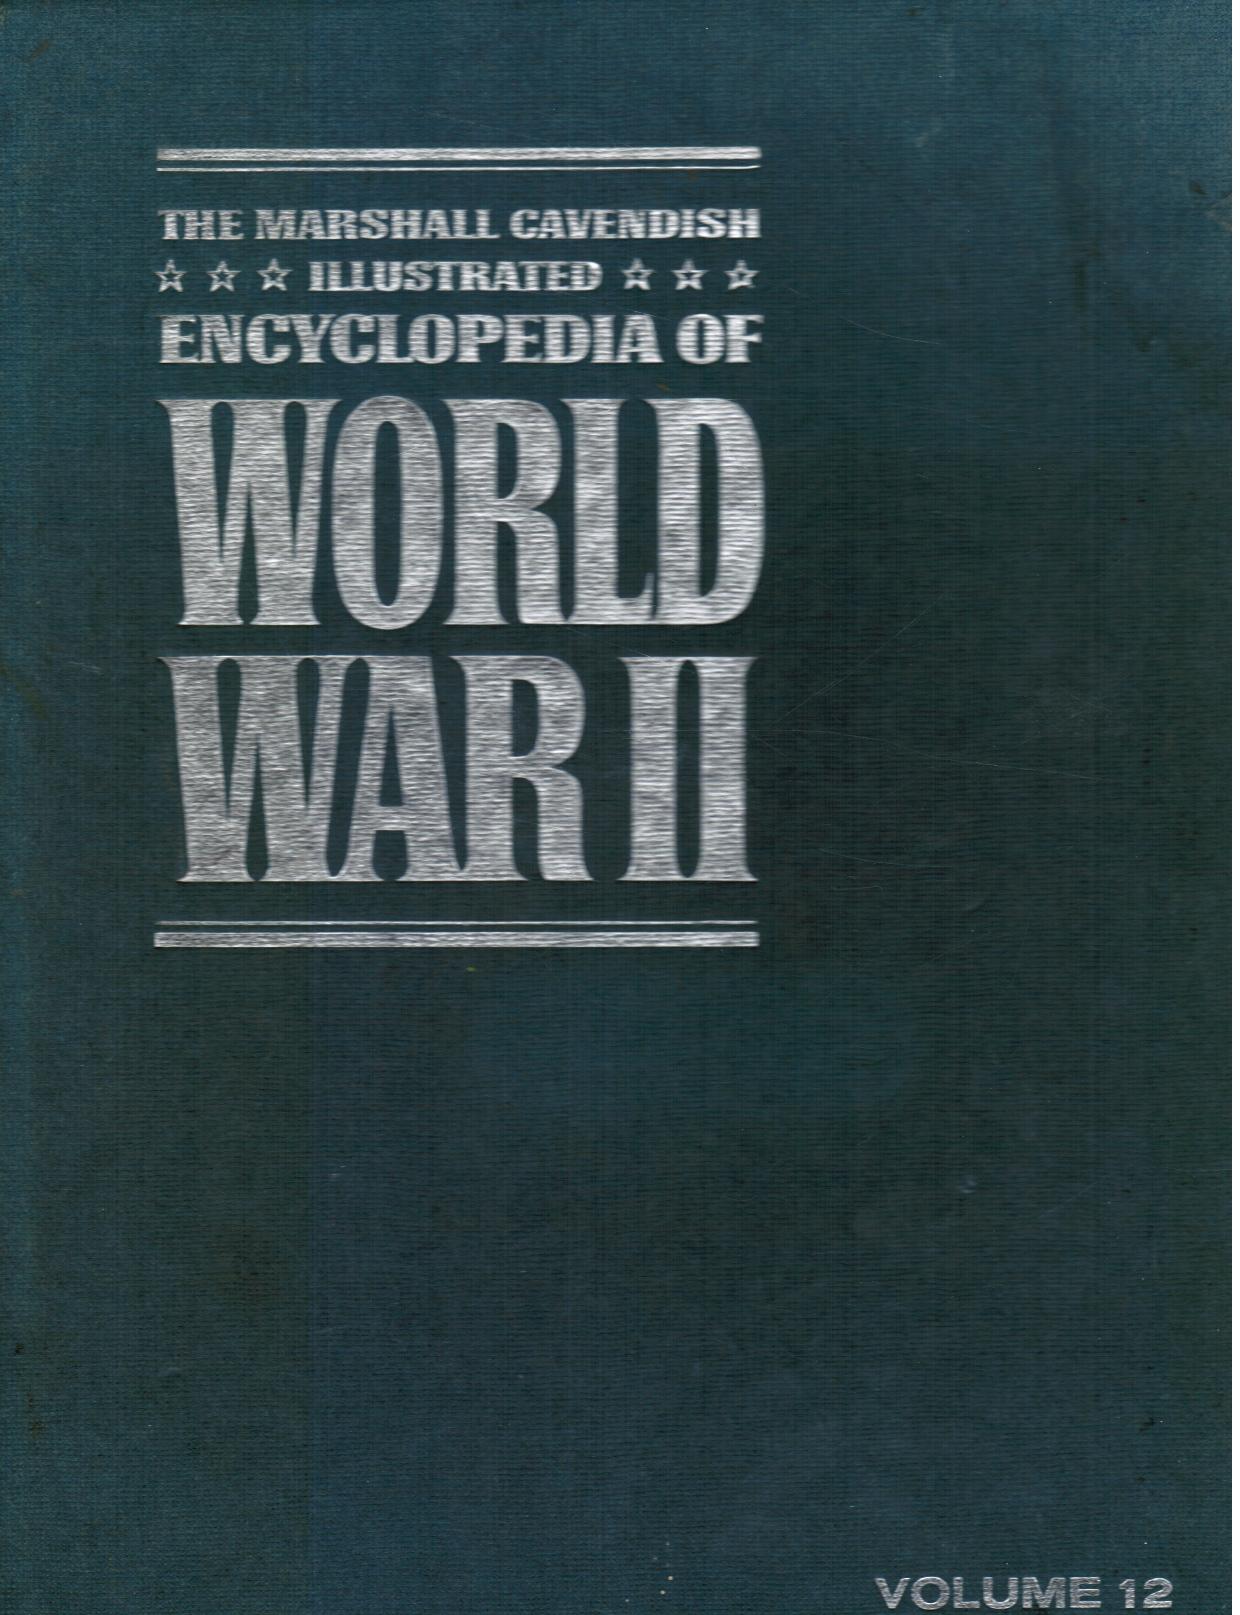 Image for The Marshall Cavendish Illustrated Encyclopedia of World War II: Volume 12 -